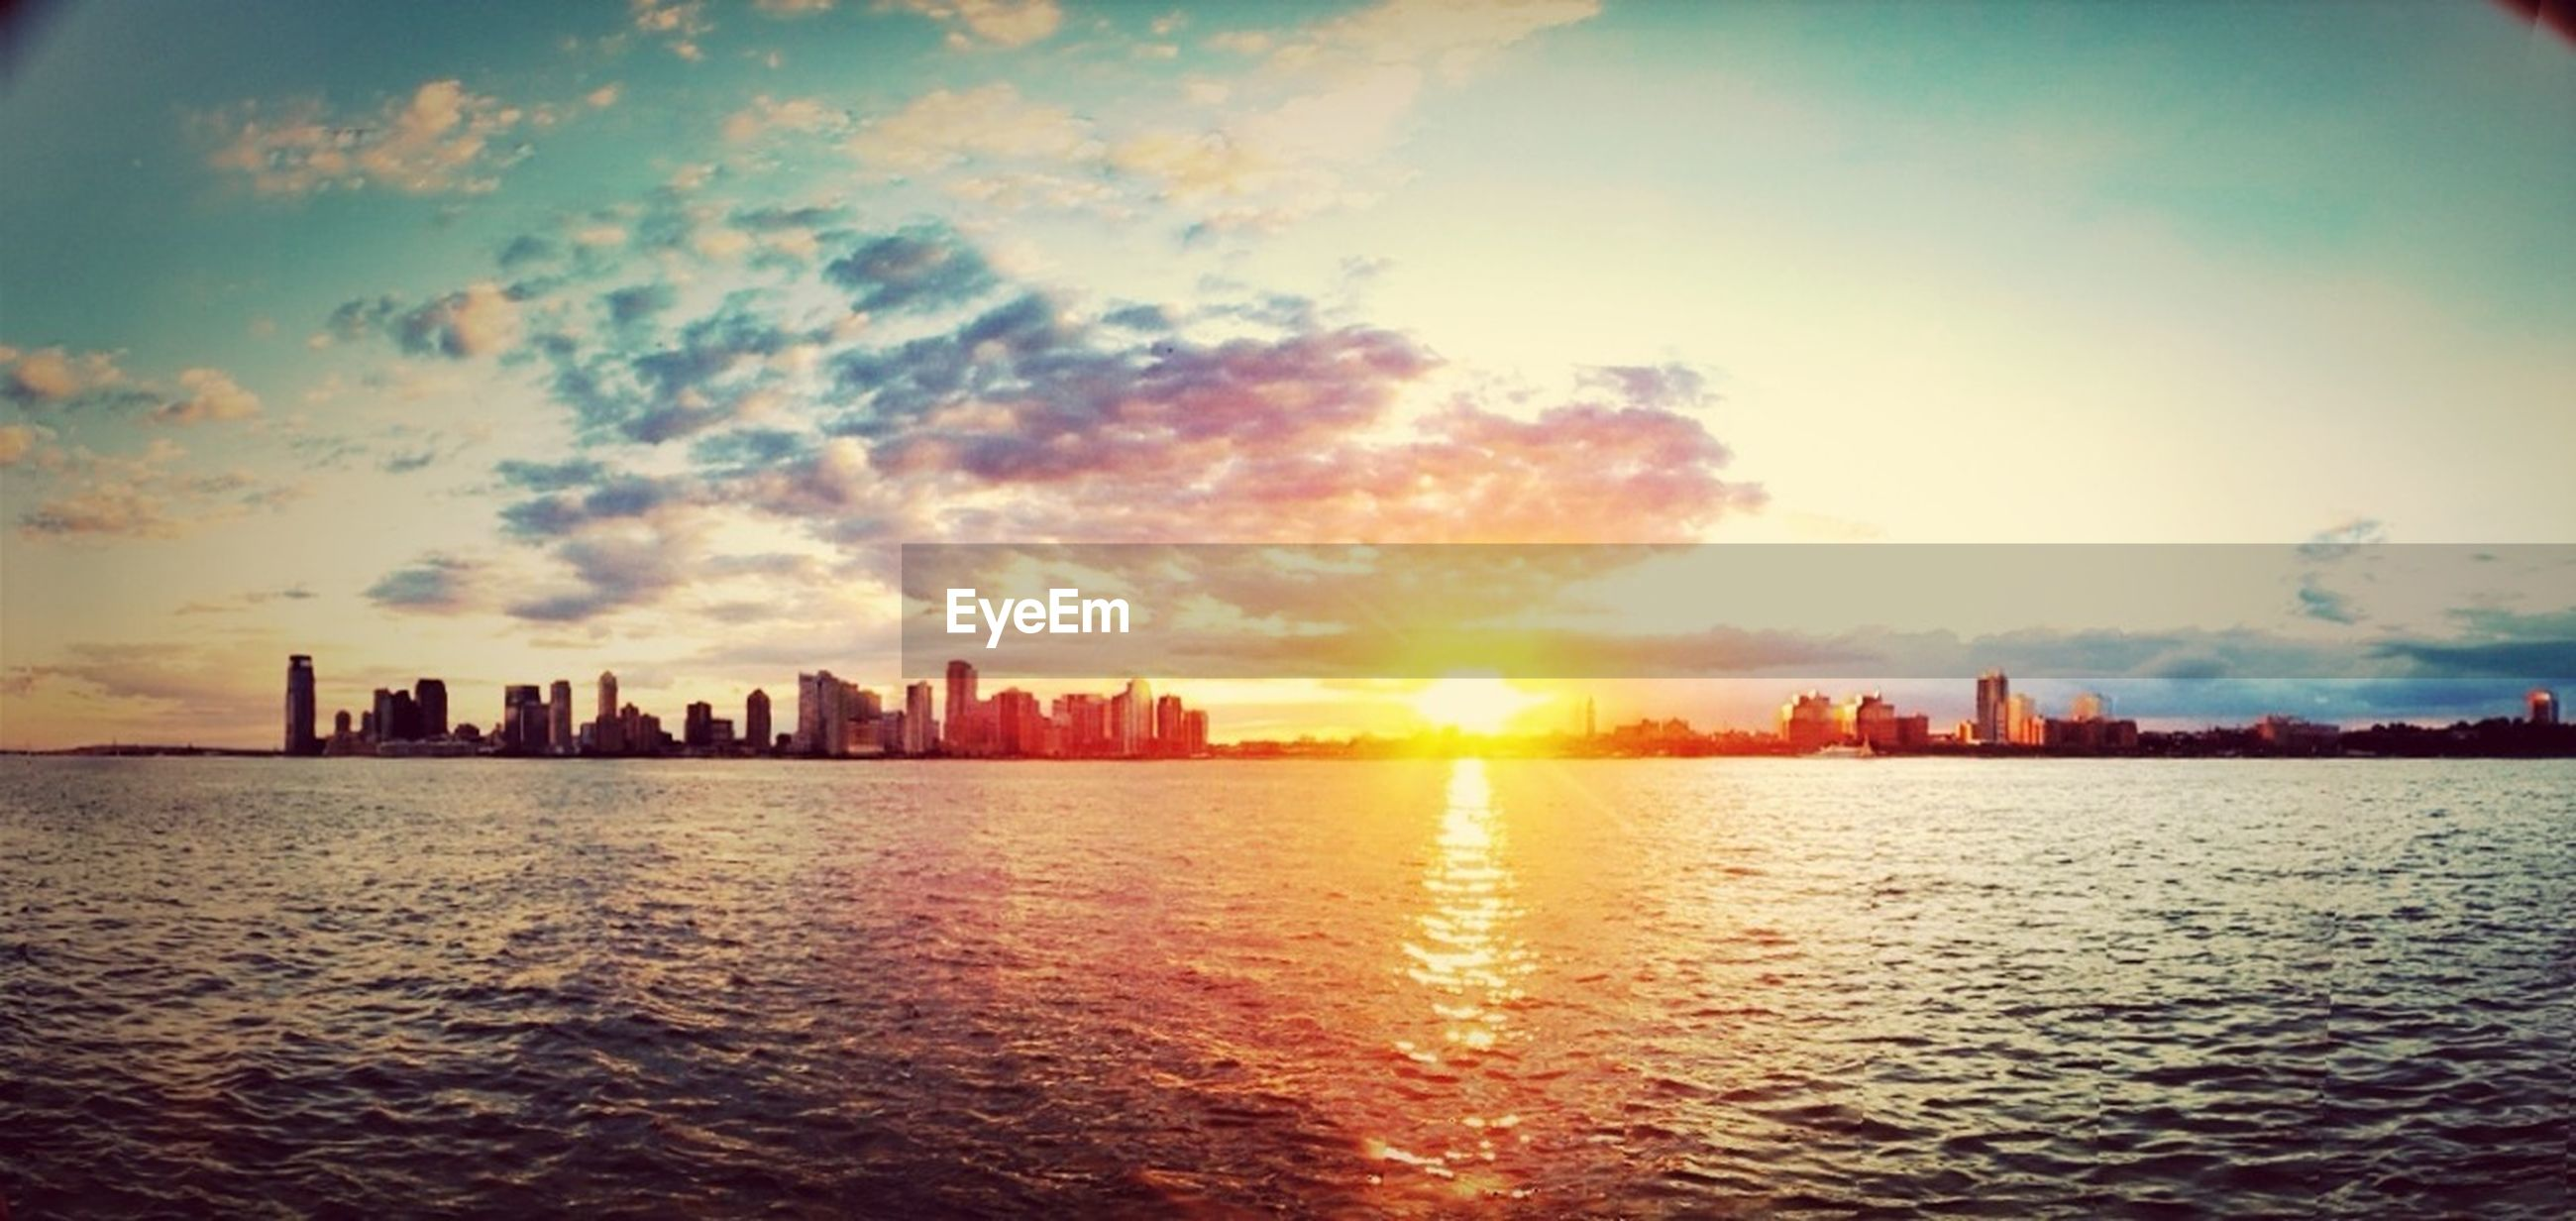 building exterior, sunset, waterfront, architecture, water, built structure, sky, city, sun, silhouette, urban skyline, cityscape, cloud - sky, sea, skyscraper, sunlight, rippled, scenics, reflection, cloud